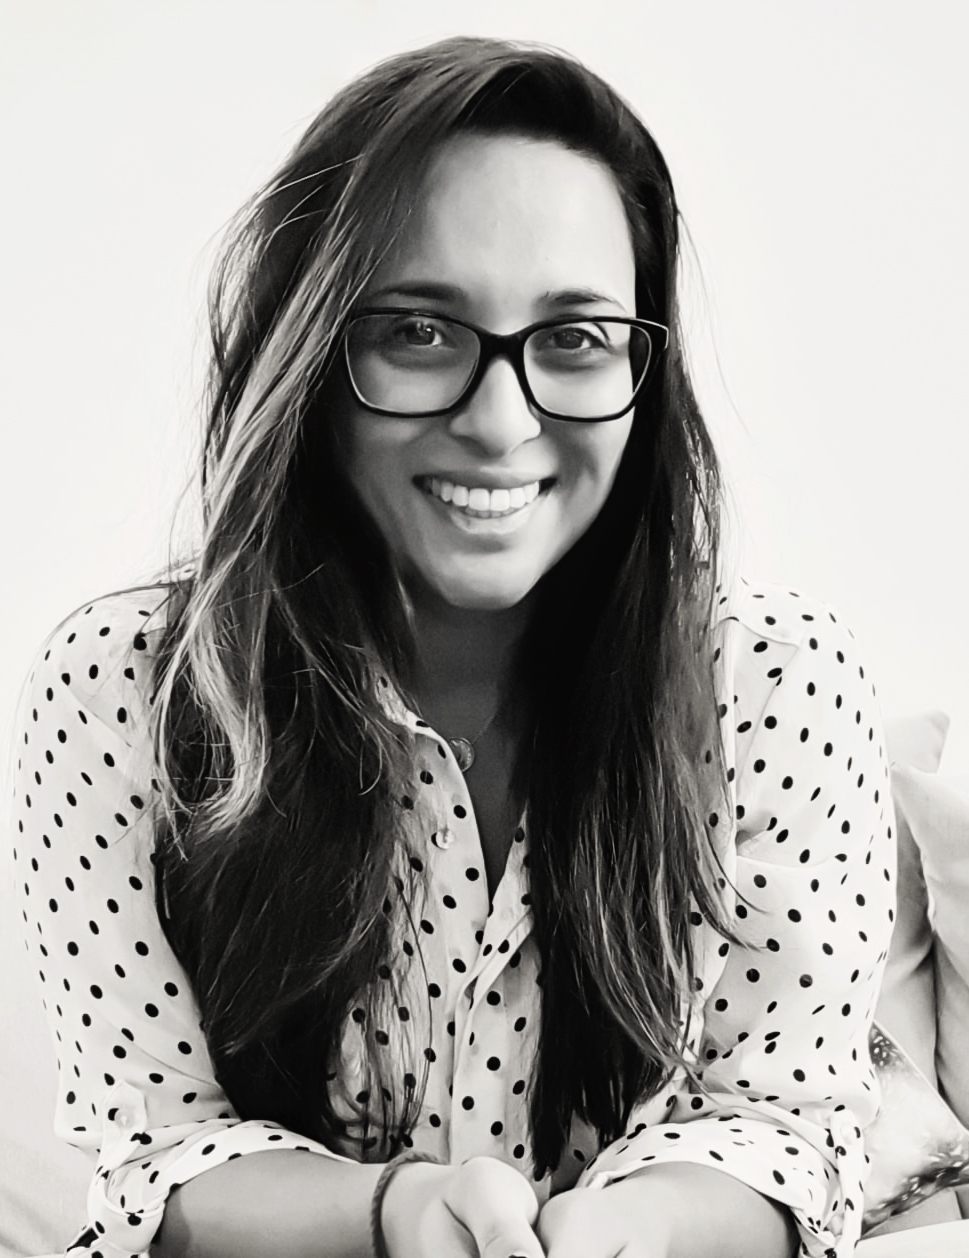 Sharika Profile Photo